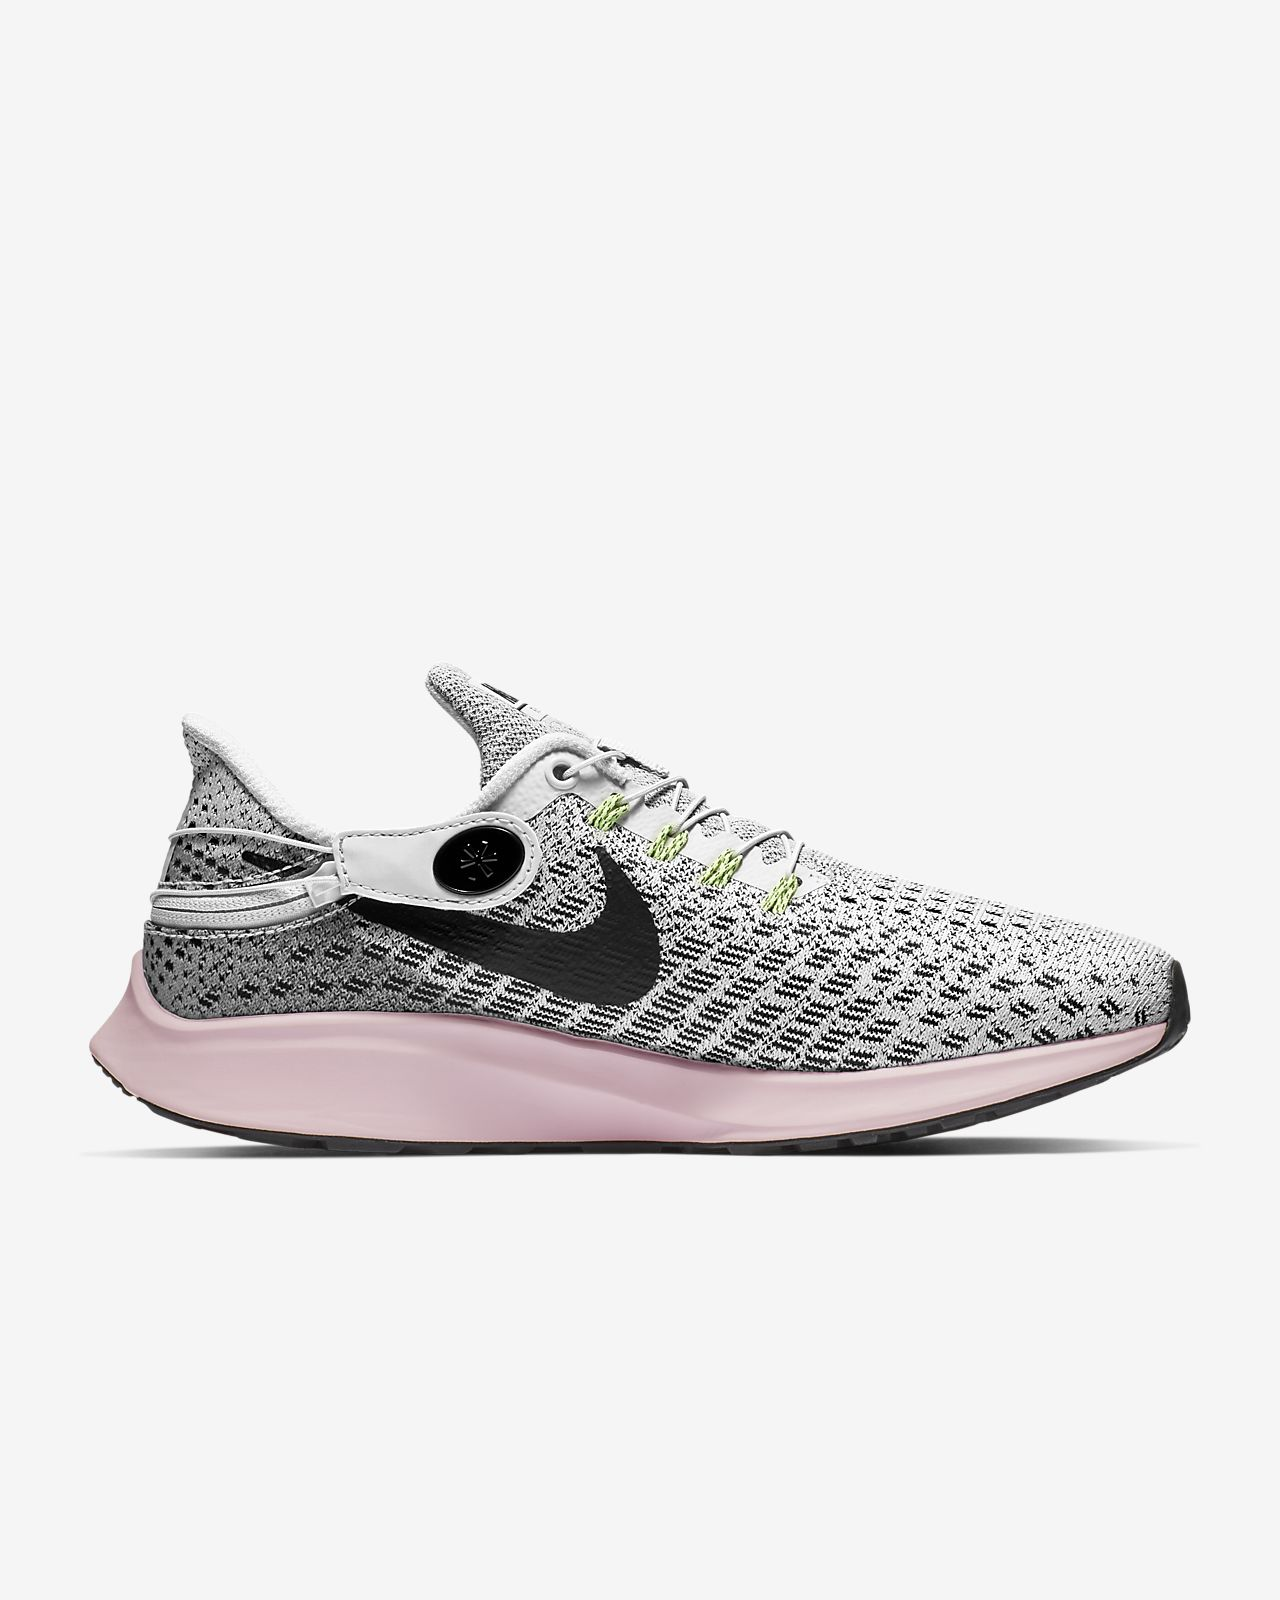 best sneakers e15c1 de722 Nike Air Zoom Pegasus 35 FlyEase Hardloopschoen voor dames. Nike.com BE